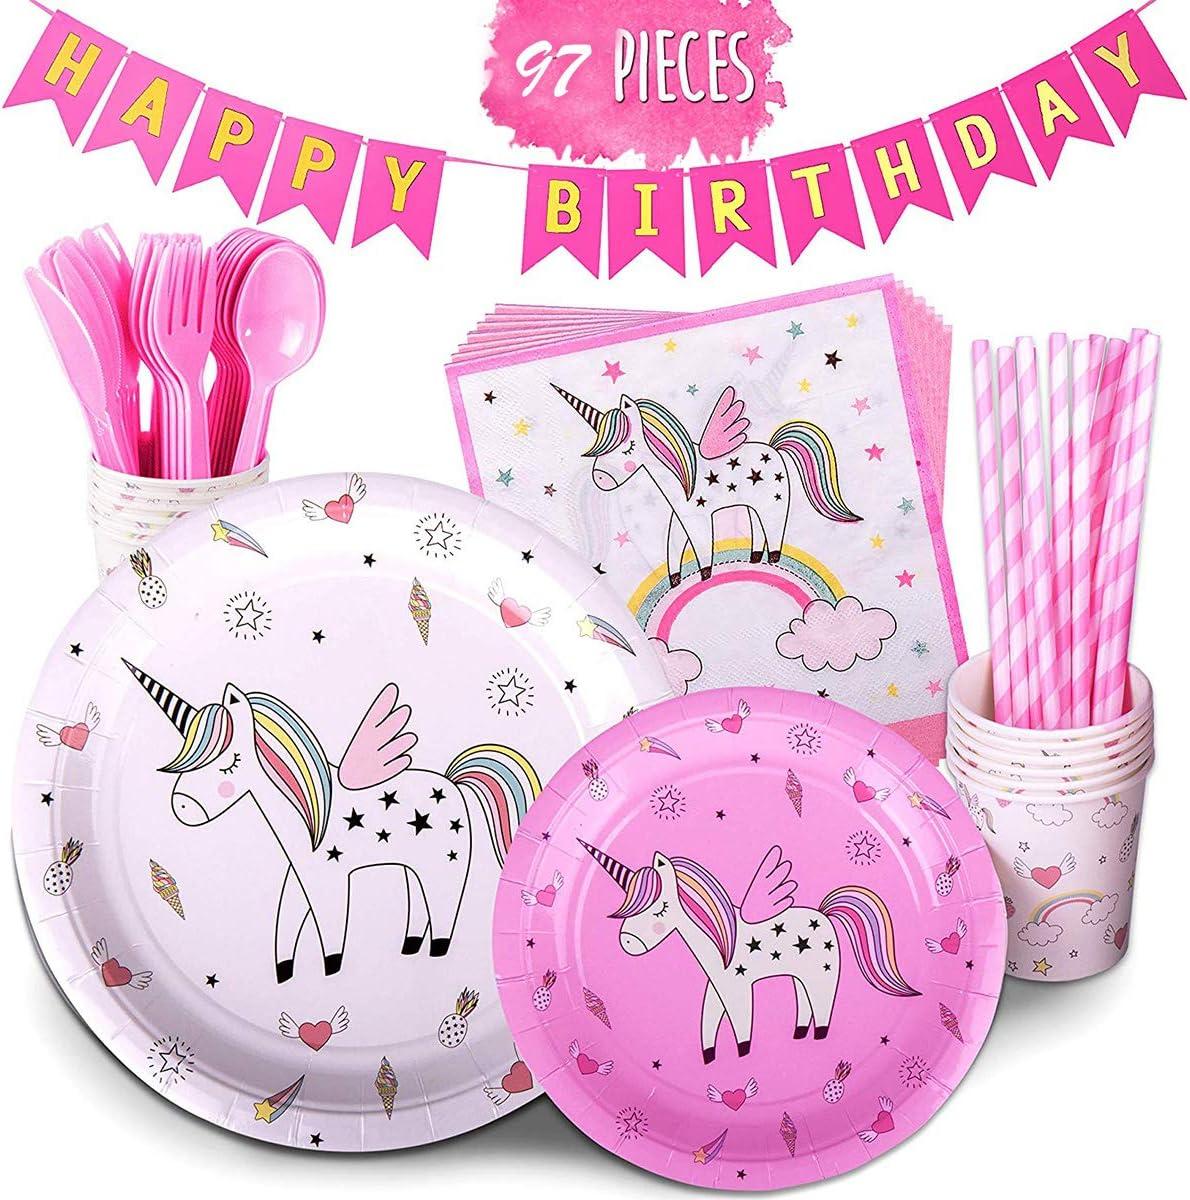 Amycute 97 pcs Vajilla de Fiesta de Cumplea/ños Unicornio Ni/ña Happy Birthday Fiesta Unicornio Rosa Vajilla Desechable para 12 ni/ños de cumplea/ños Cumplea/ños de ni/ño Fiesta Deco Baby Shower